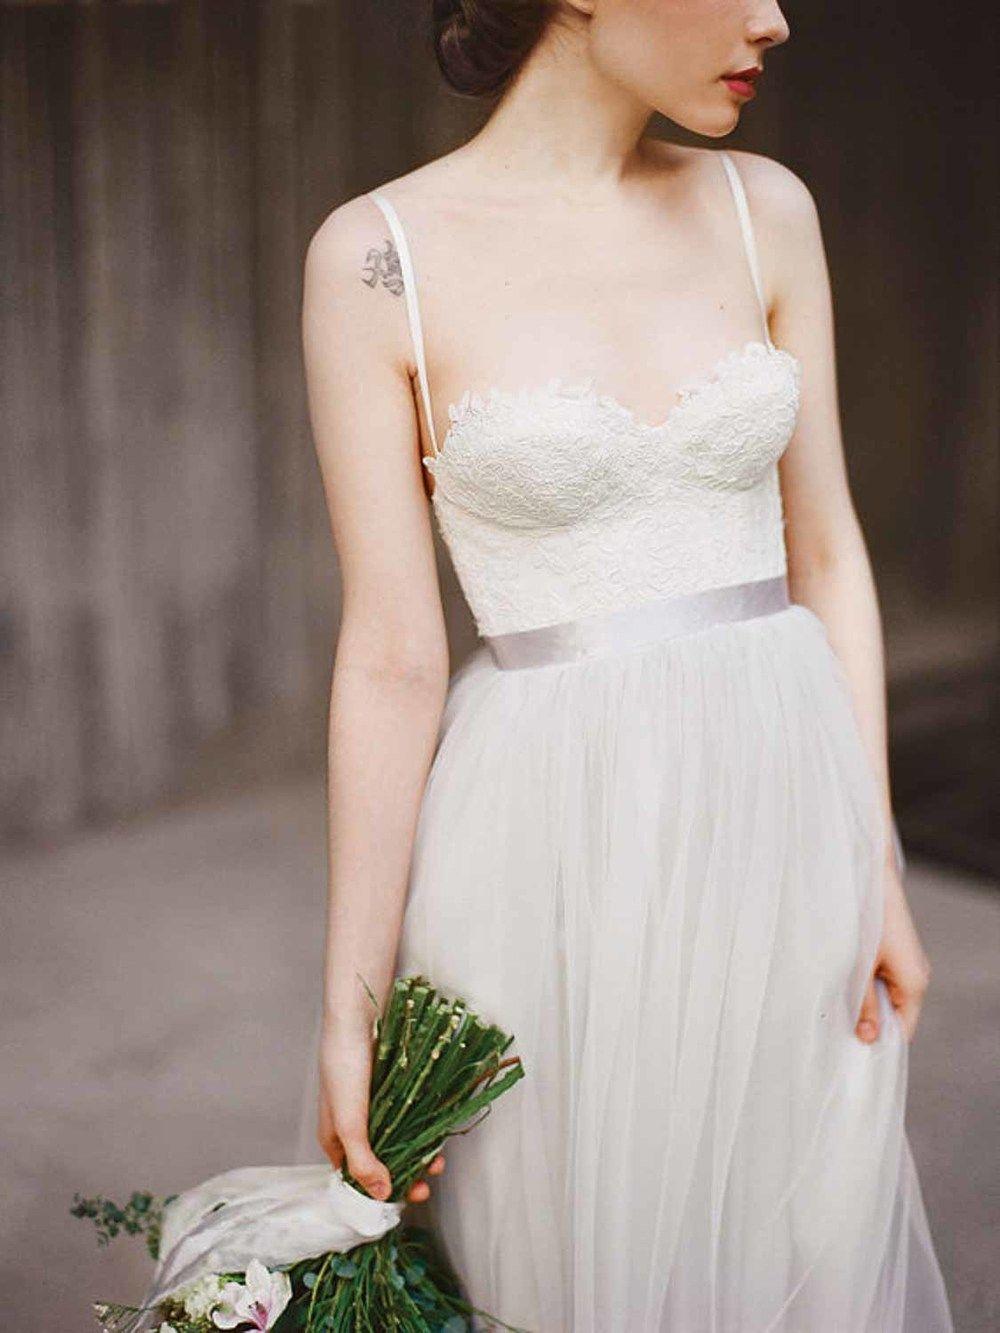 12 etsy boho wedding dresses with spaghetti straps grey weddings